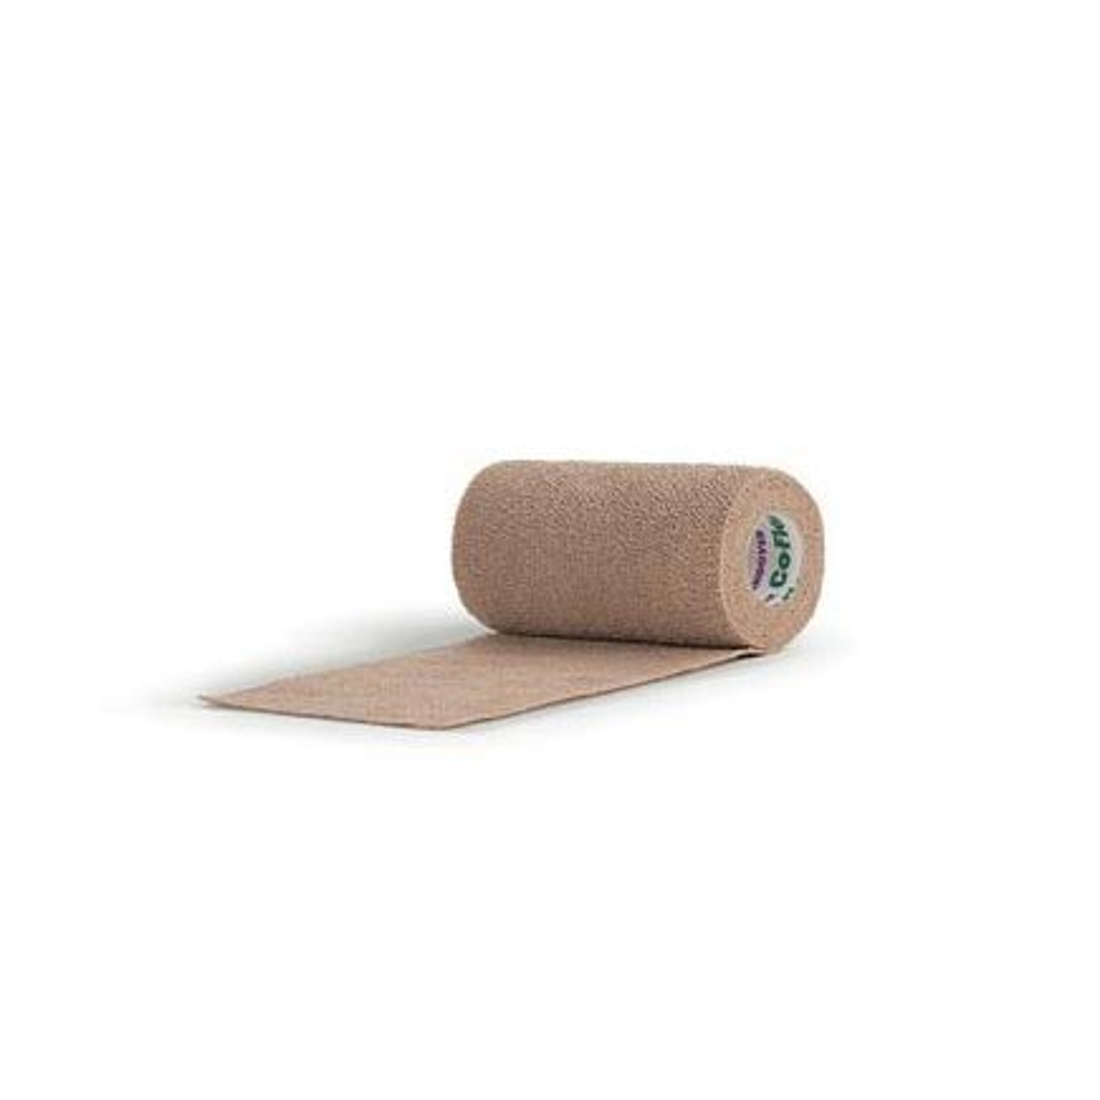 "Unna-FLEx Compression Bandage Convenience Pack 4"" x 10 yards"